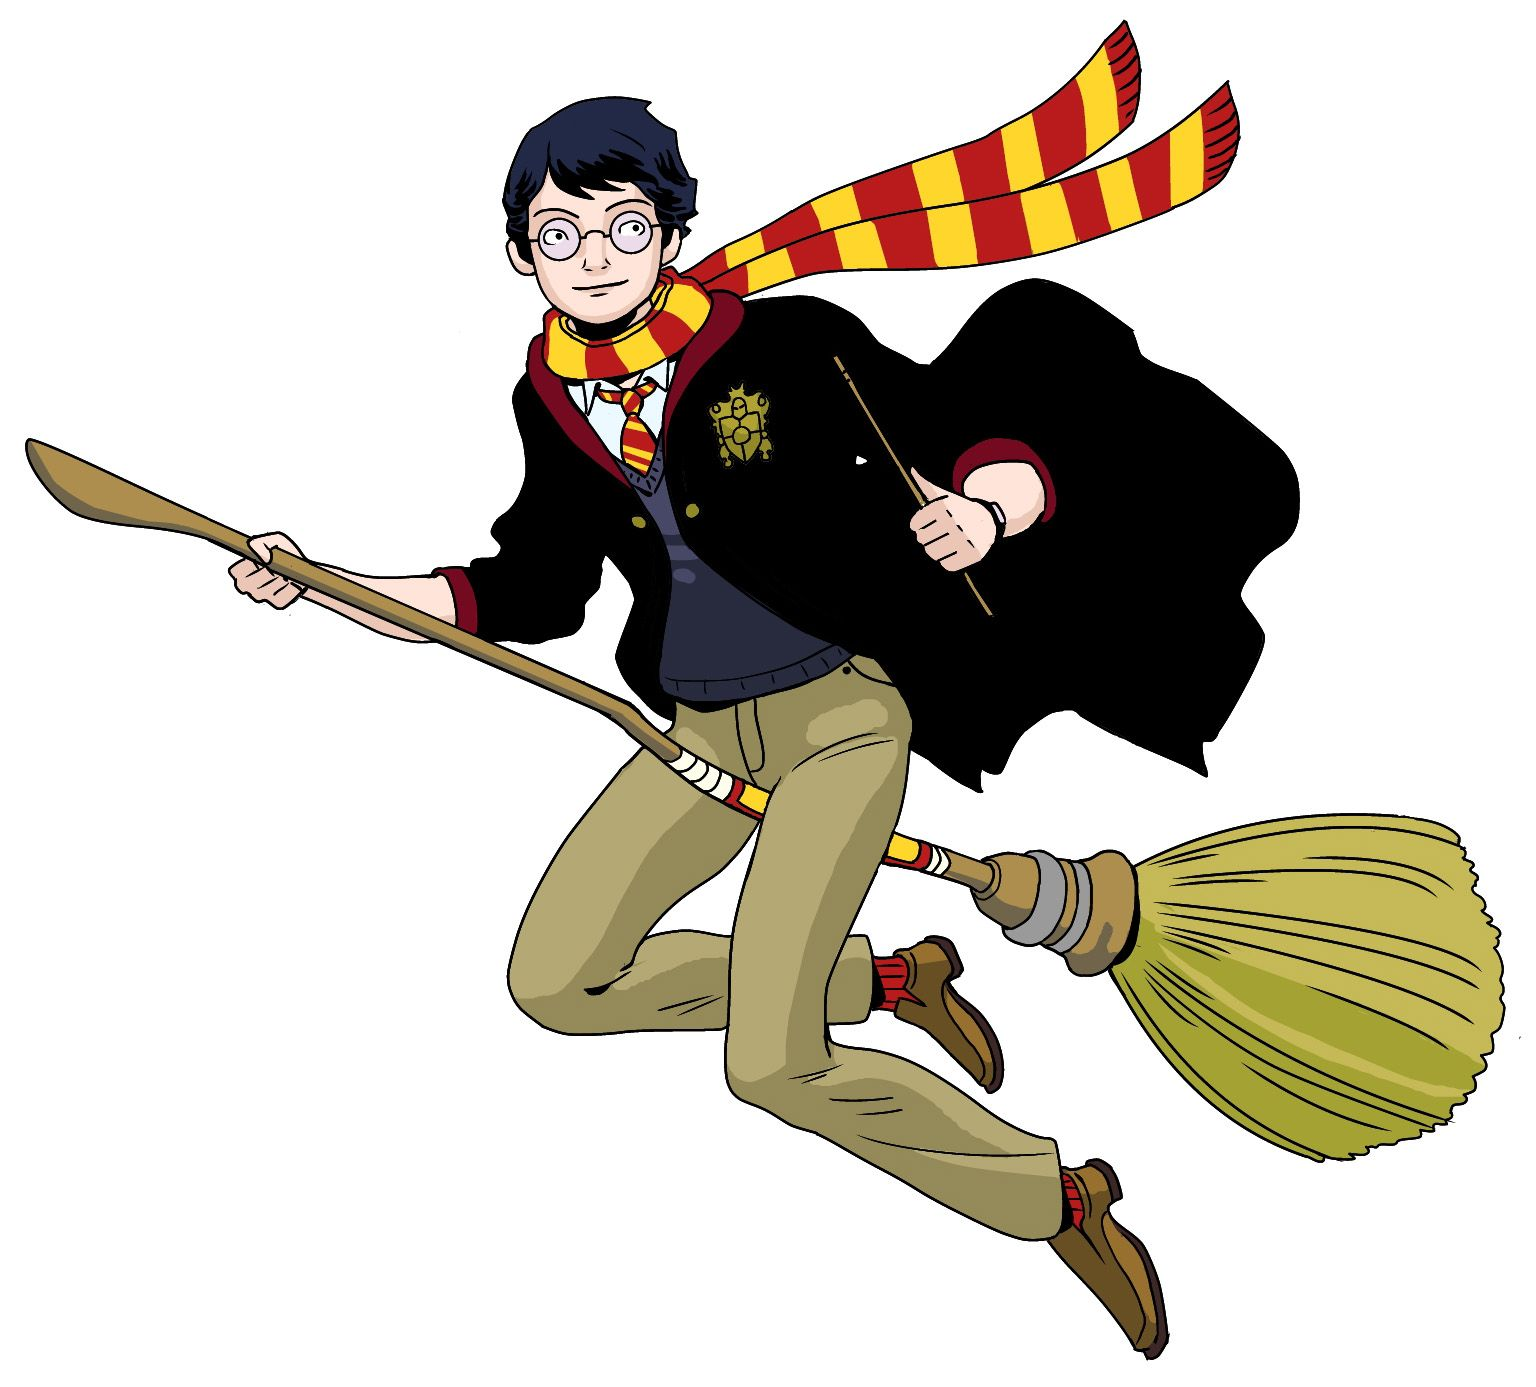 1536x1387 Image Result For Harry Potter Quidditch Cartoon Image Joy Rocks